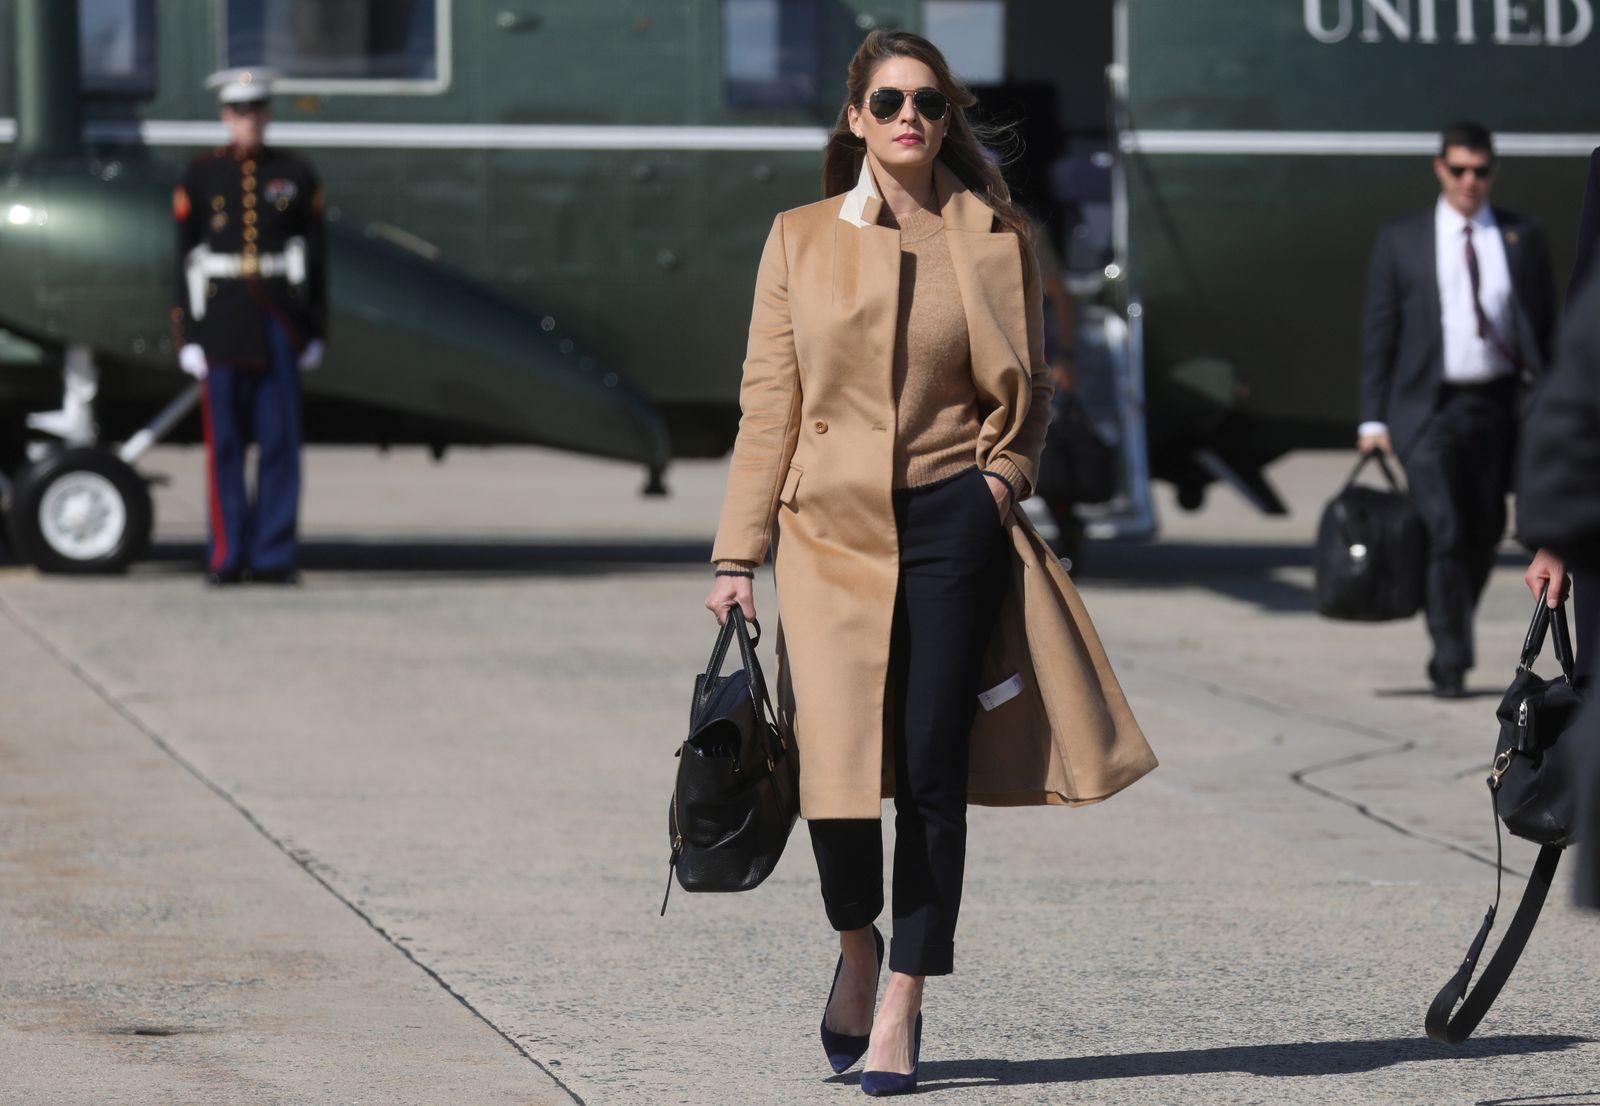 Hope Hicks, an advisor to President Trump walks to Air Force One to depart Washington